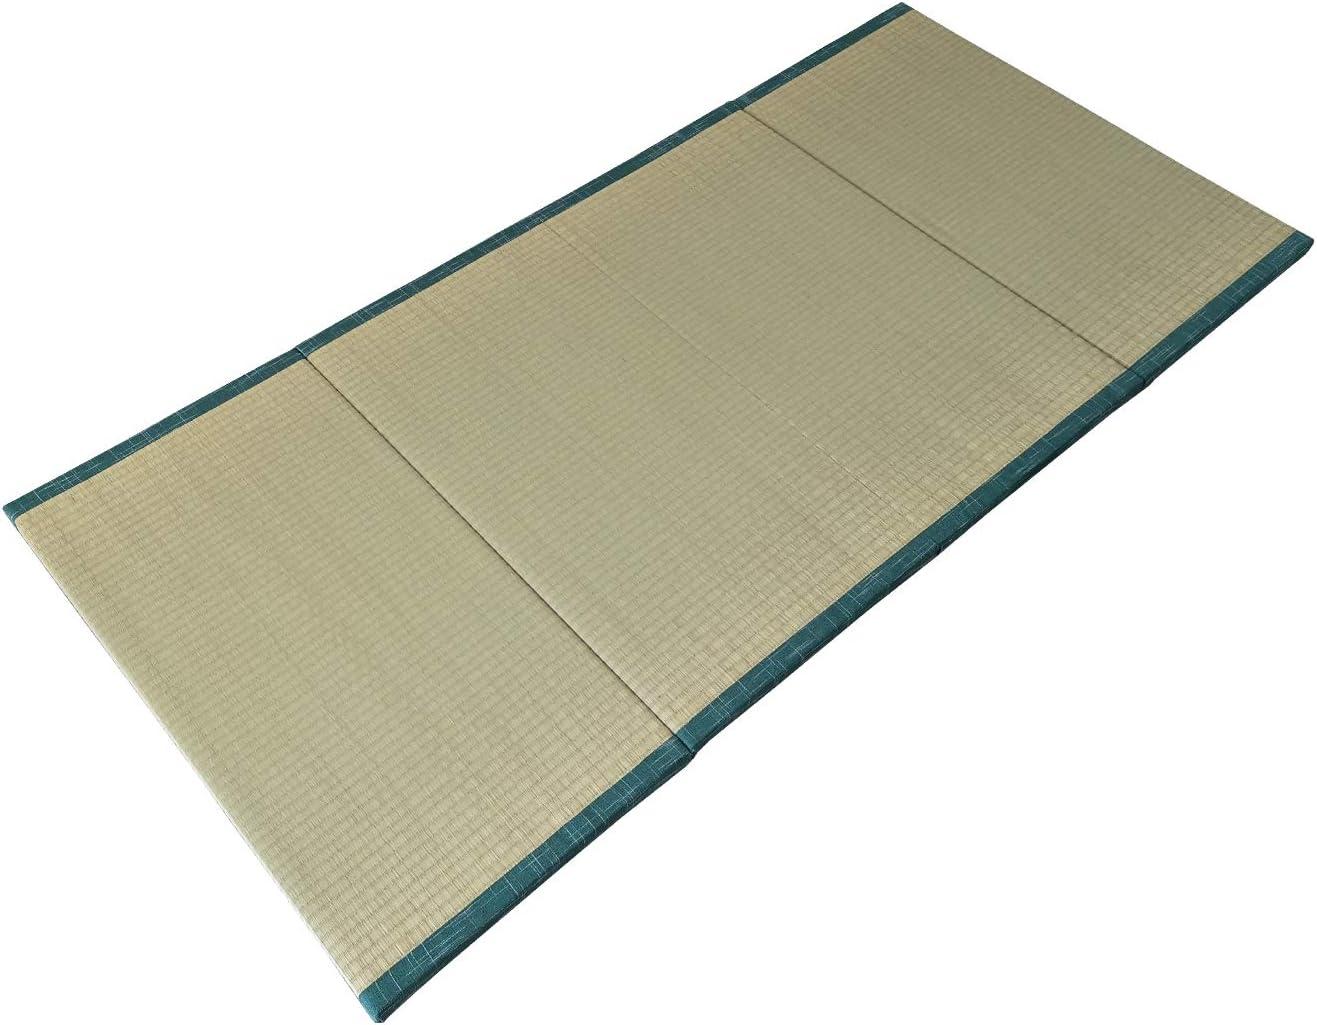 "MustMat Tatami Mat Japanese Traditional Igusa Rush Grass Tatami Mattress Folds Easily 35.4""x78.7""x1.2"""